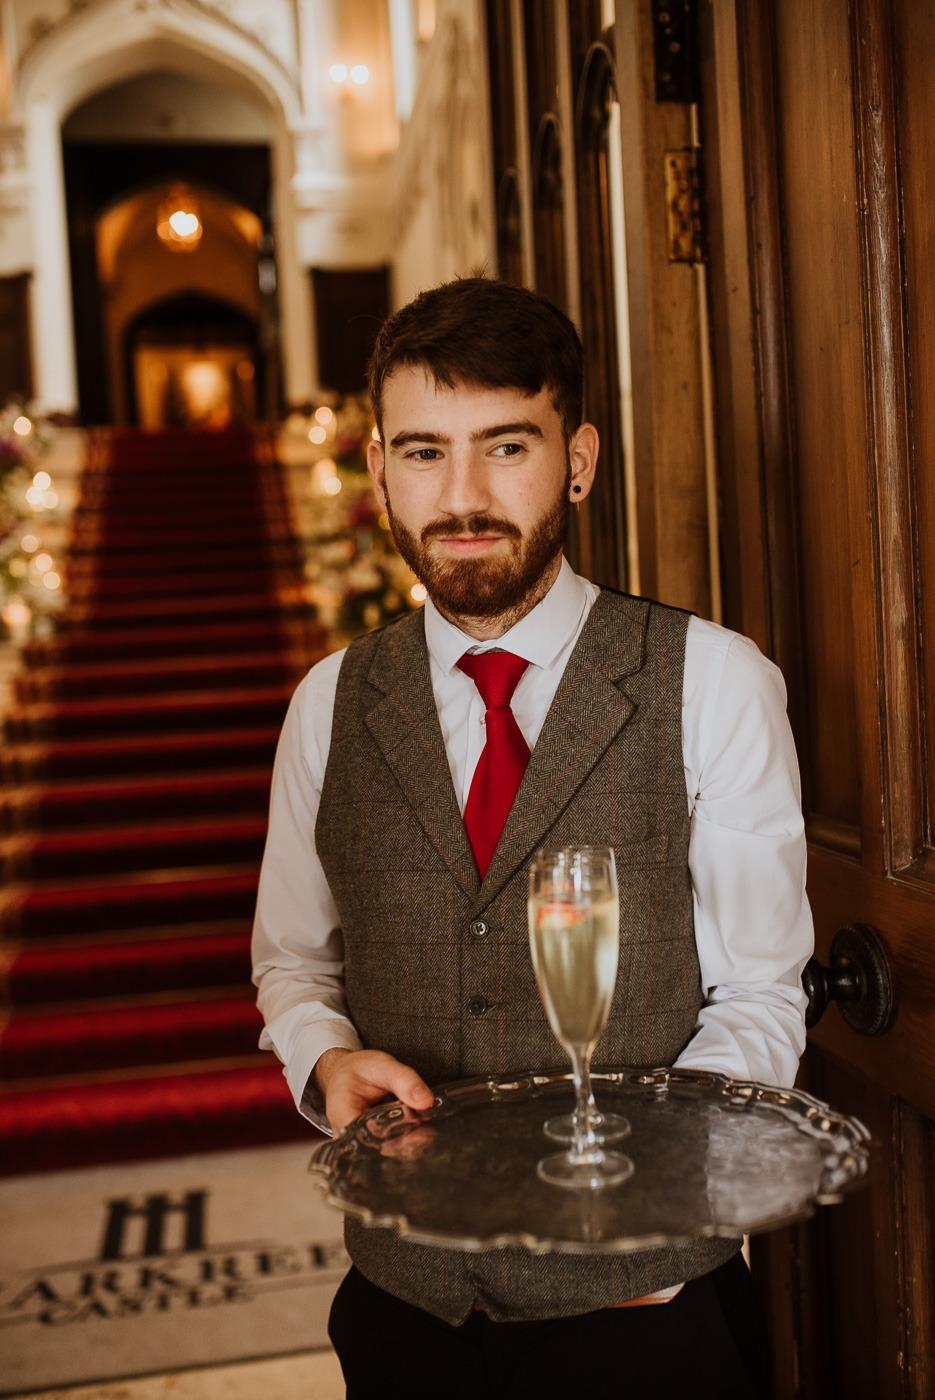 Neil Jones wearing a suit and tie